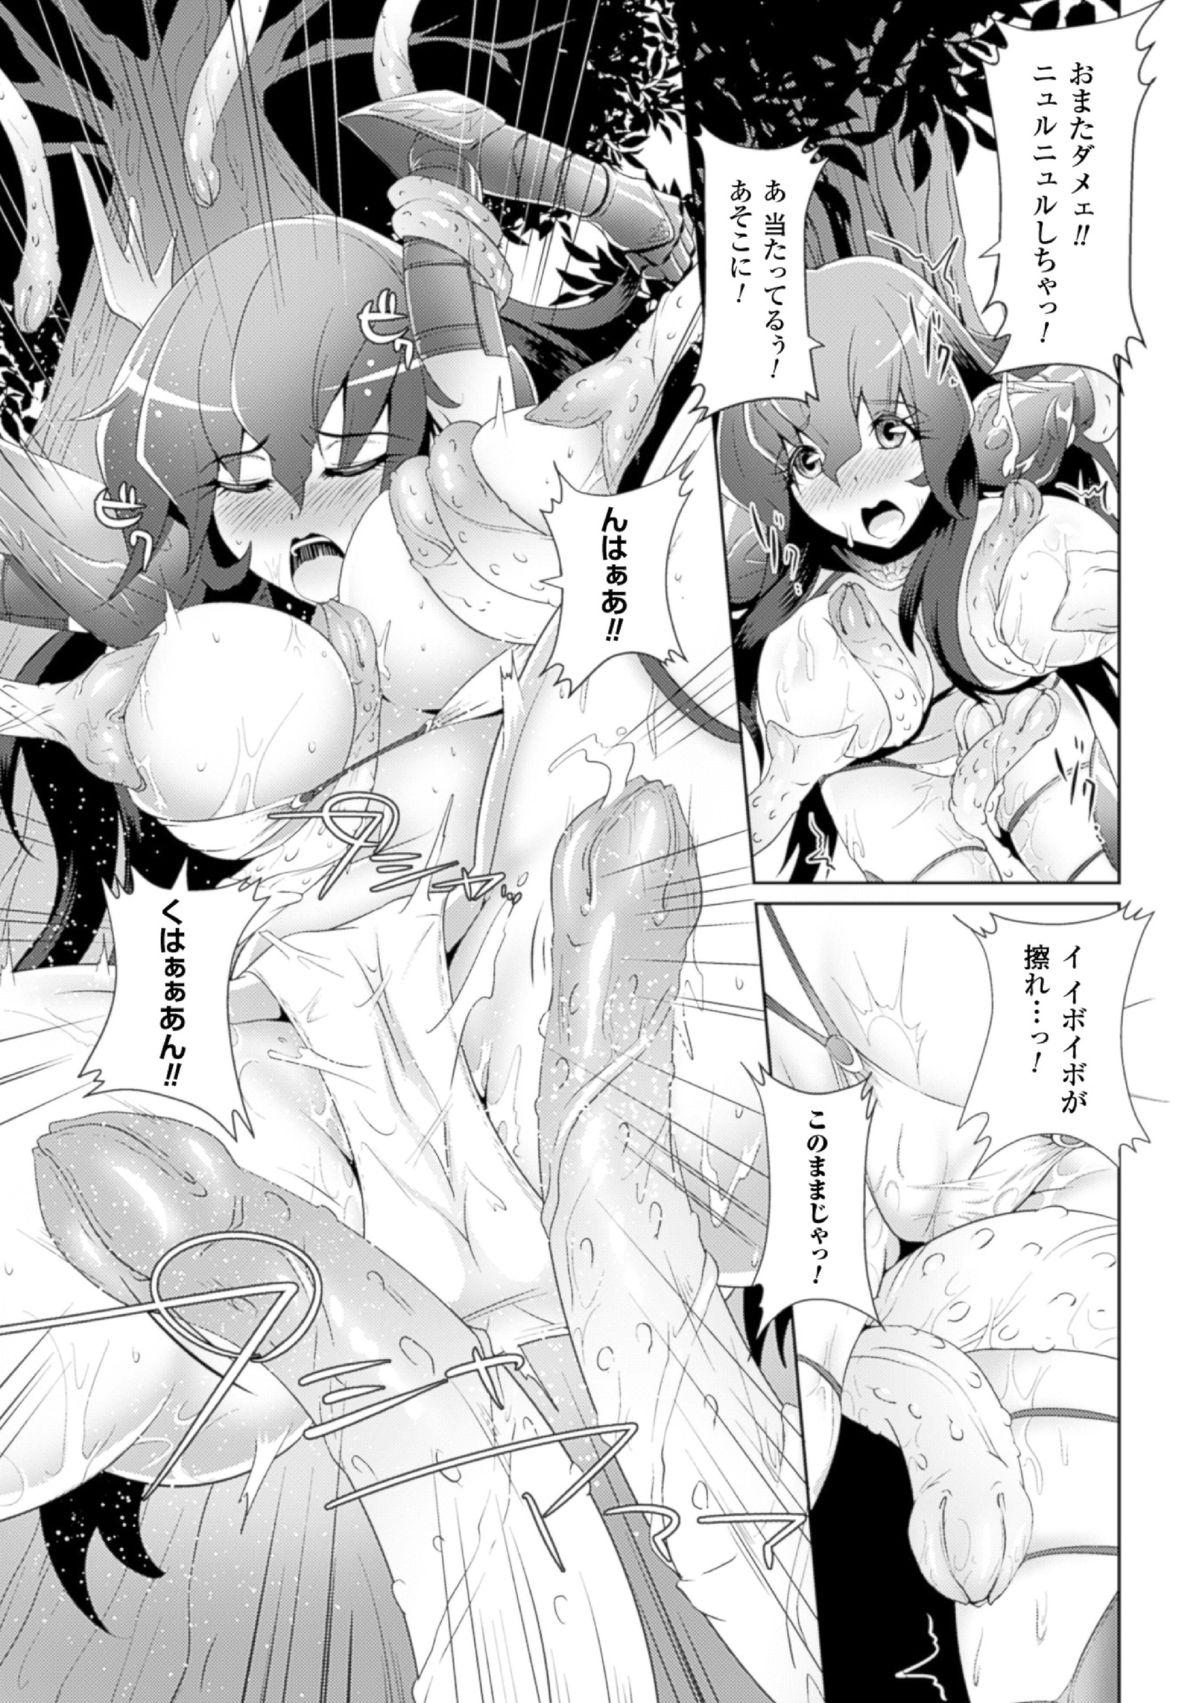 2D Comic Magazine Hunter Heroine AntholoG Vol.1 52